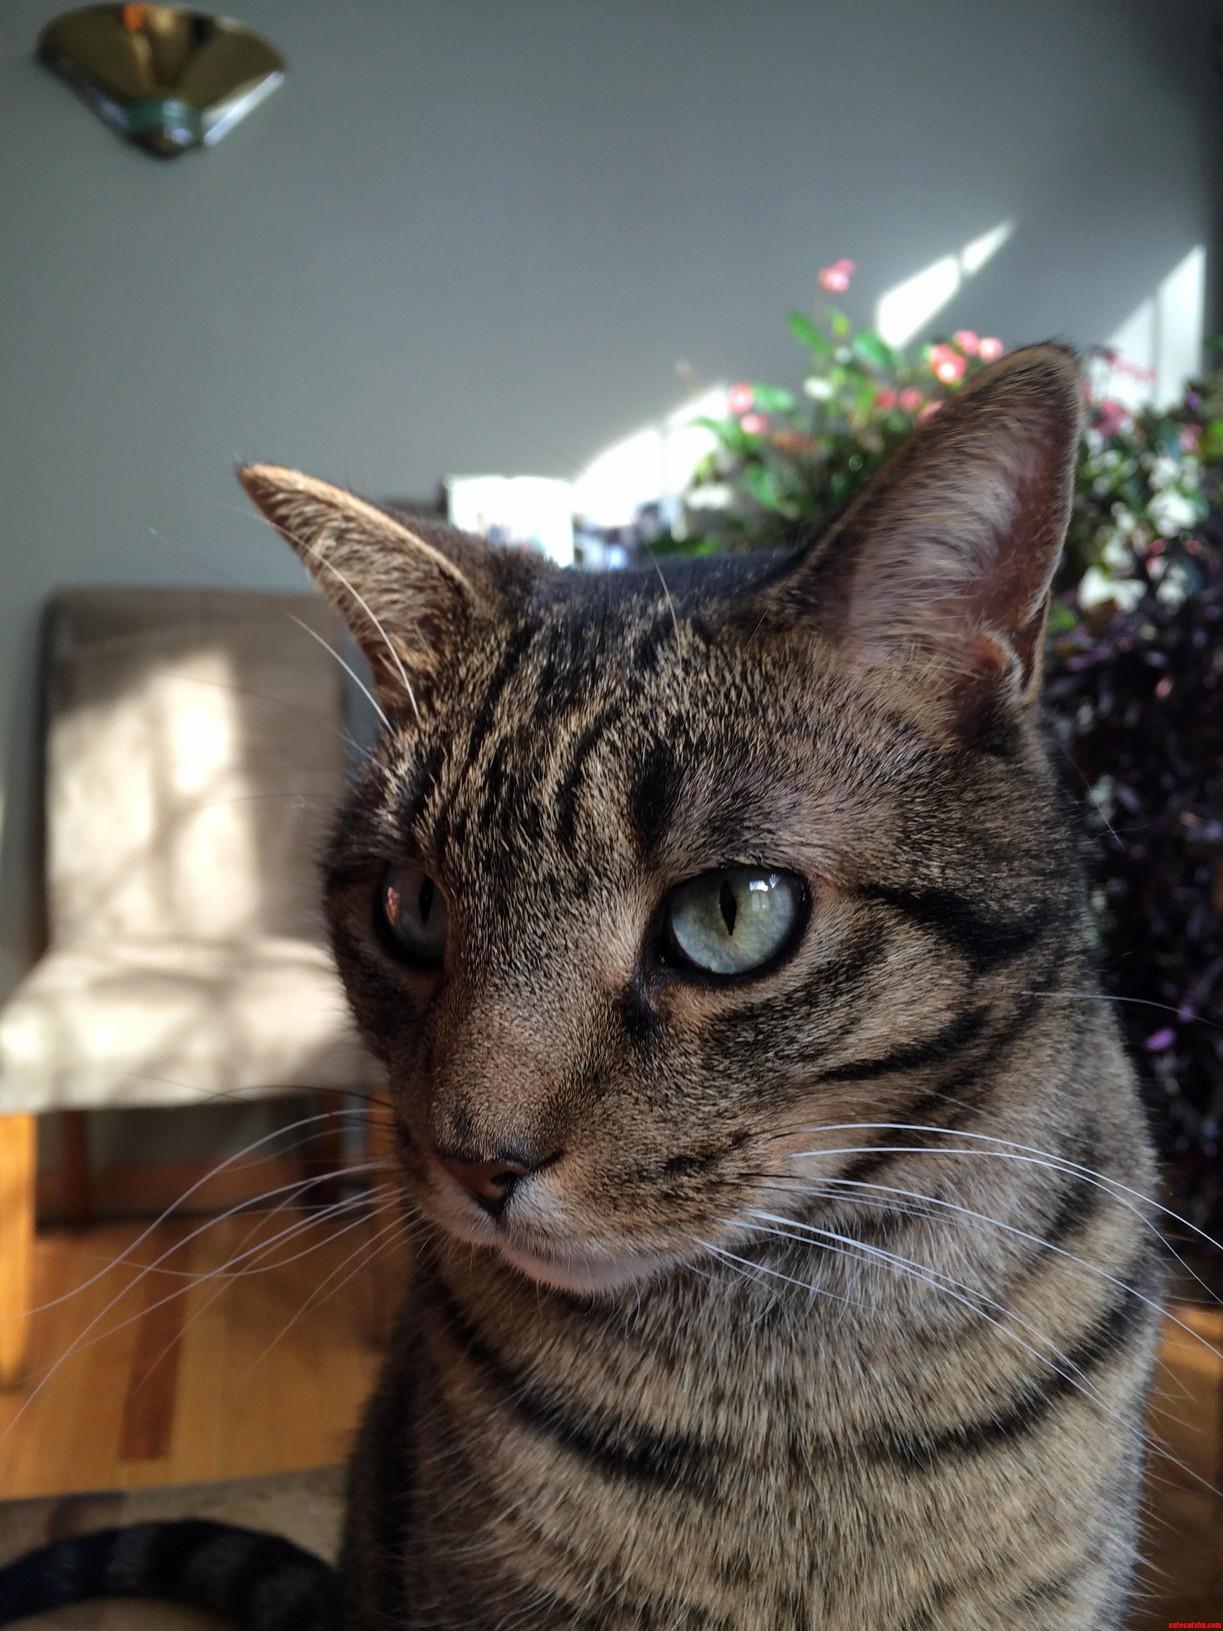 My cat mew